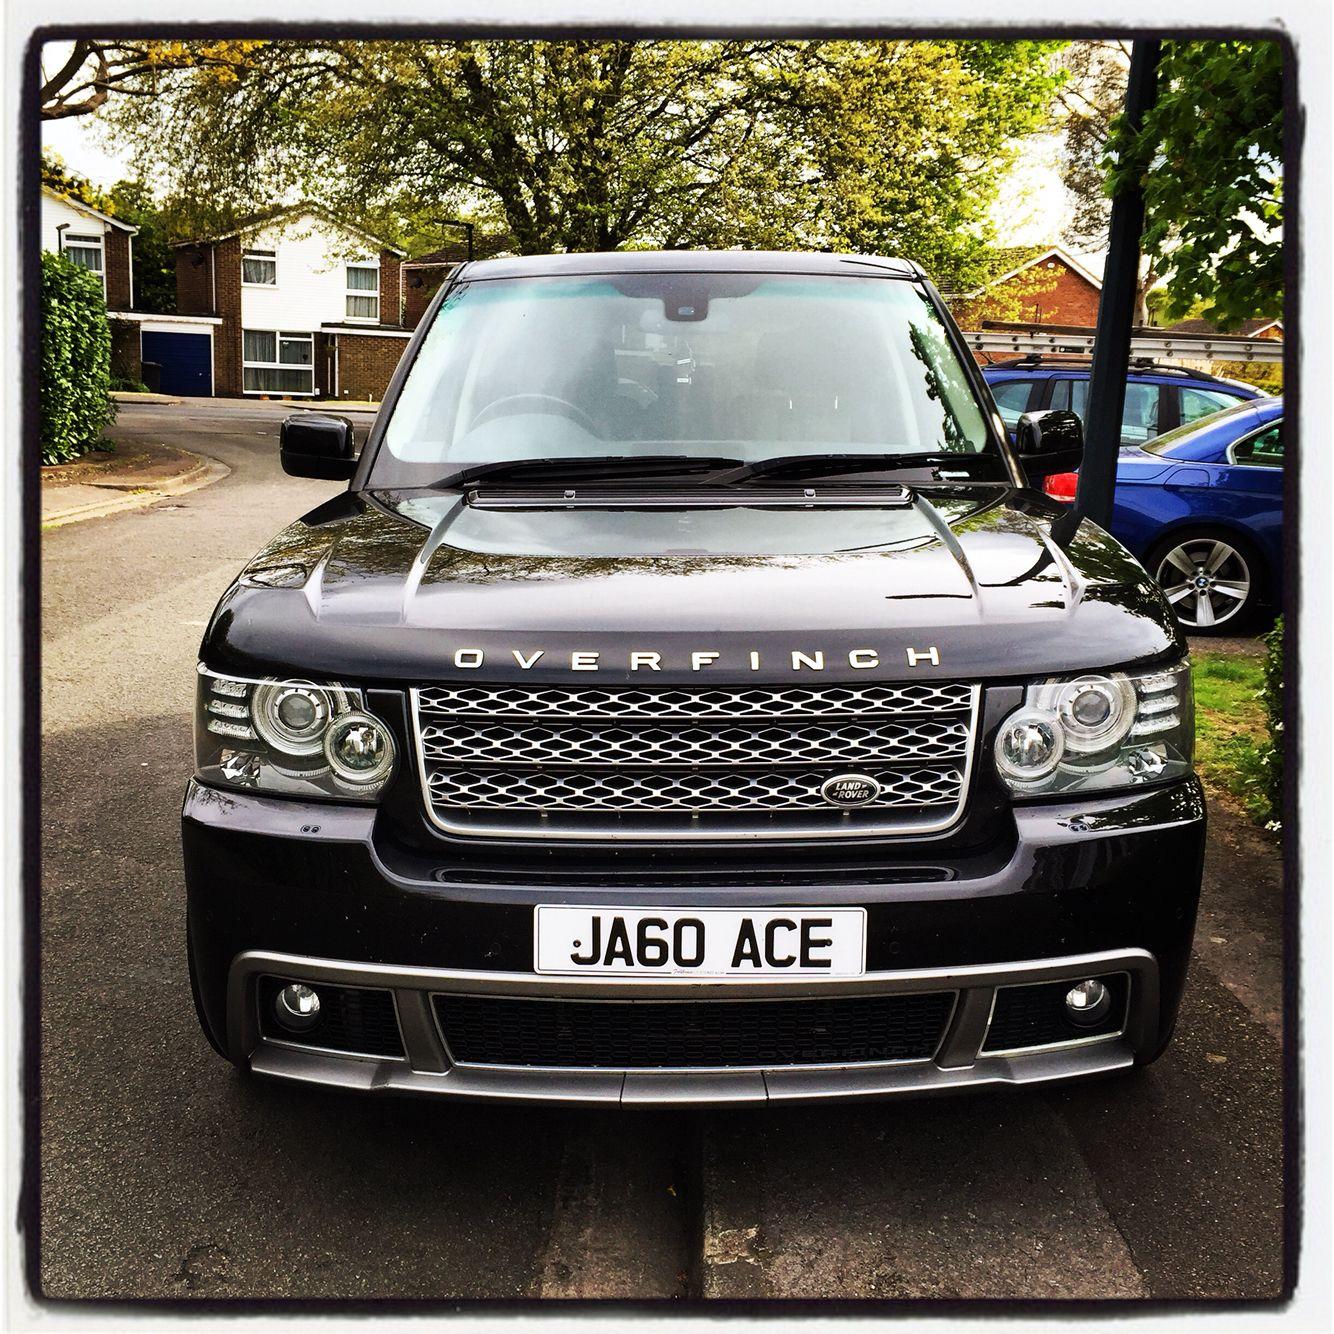 Hse Land Rover: Range Rover, Range